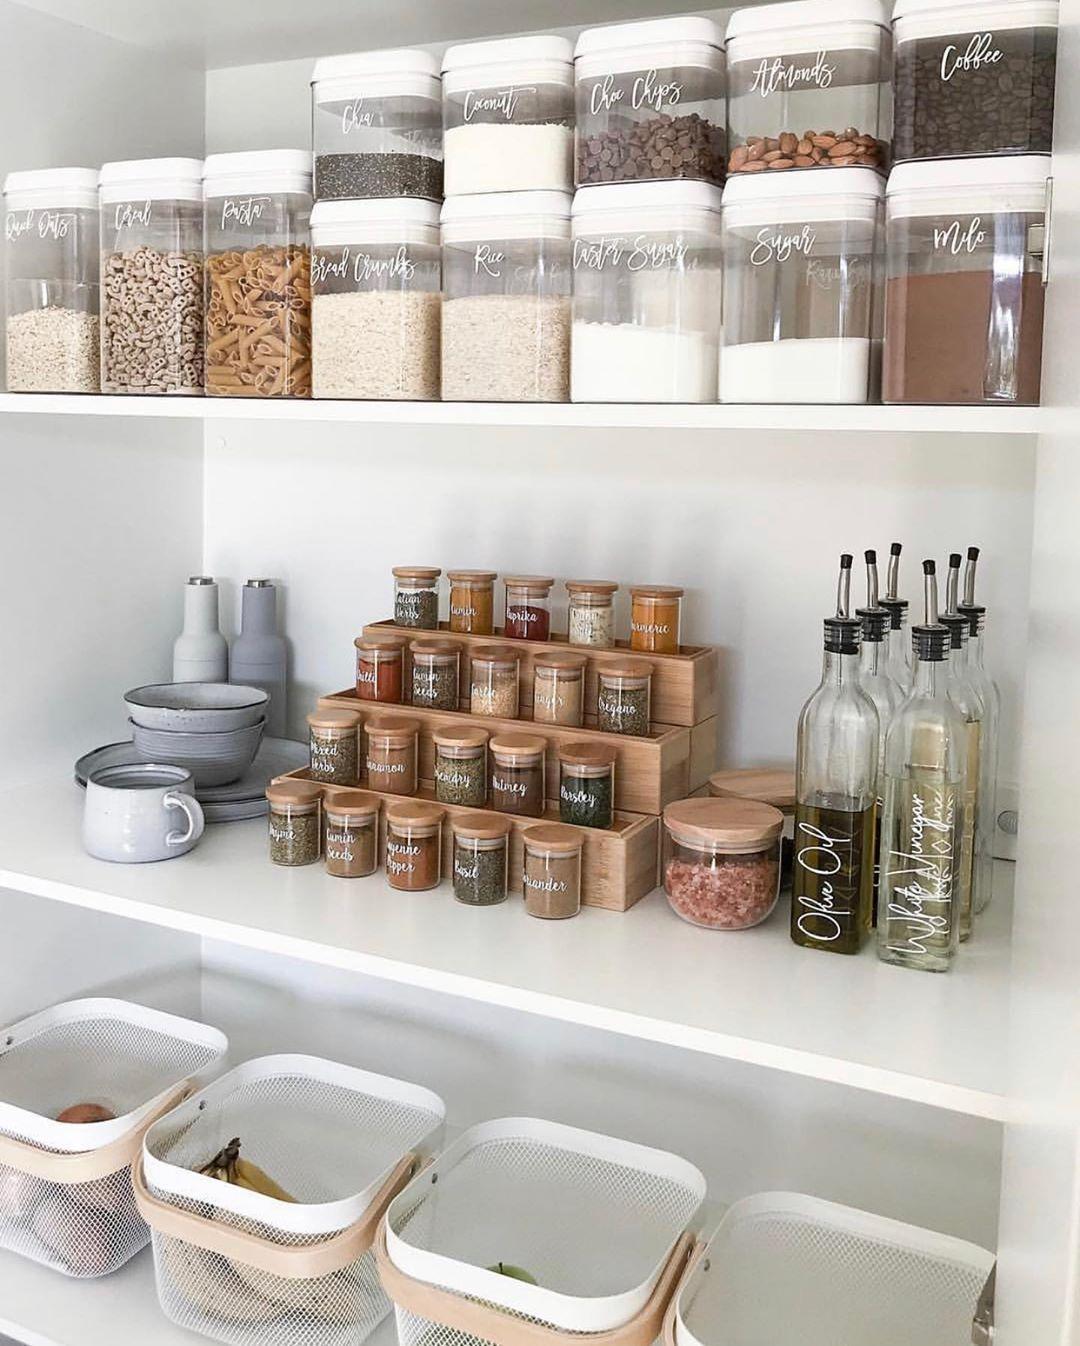 Design a Minimalist Kitchen with These 15 Ideas